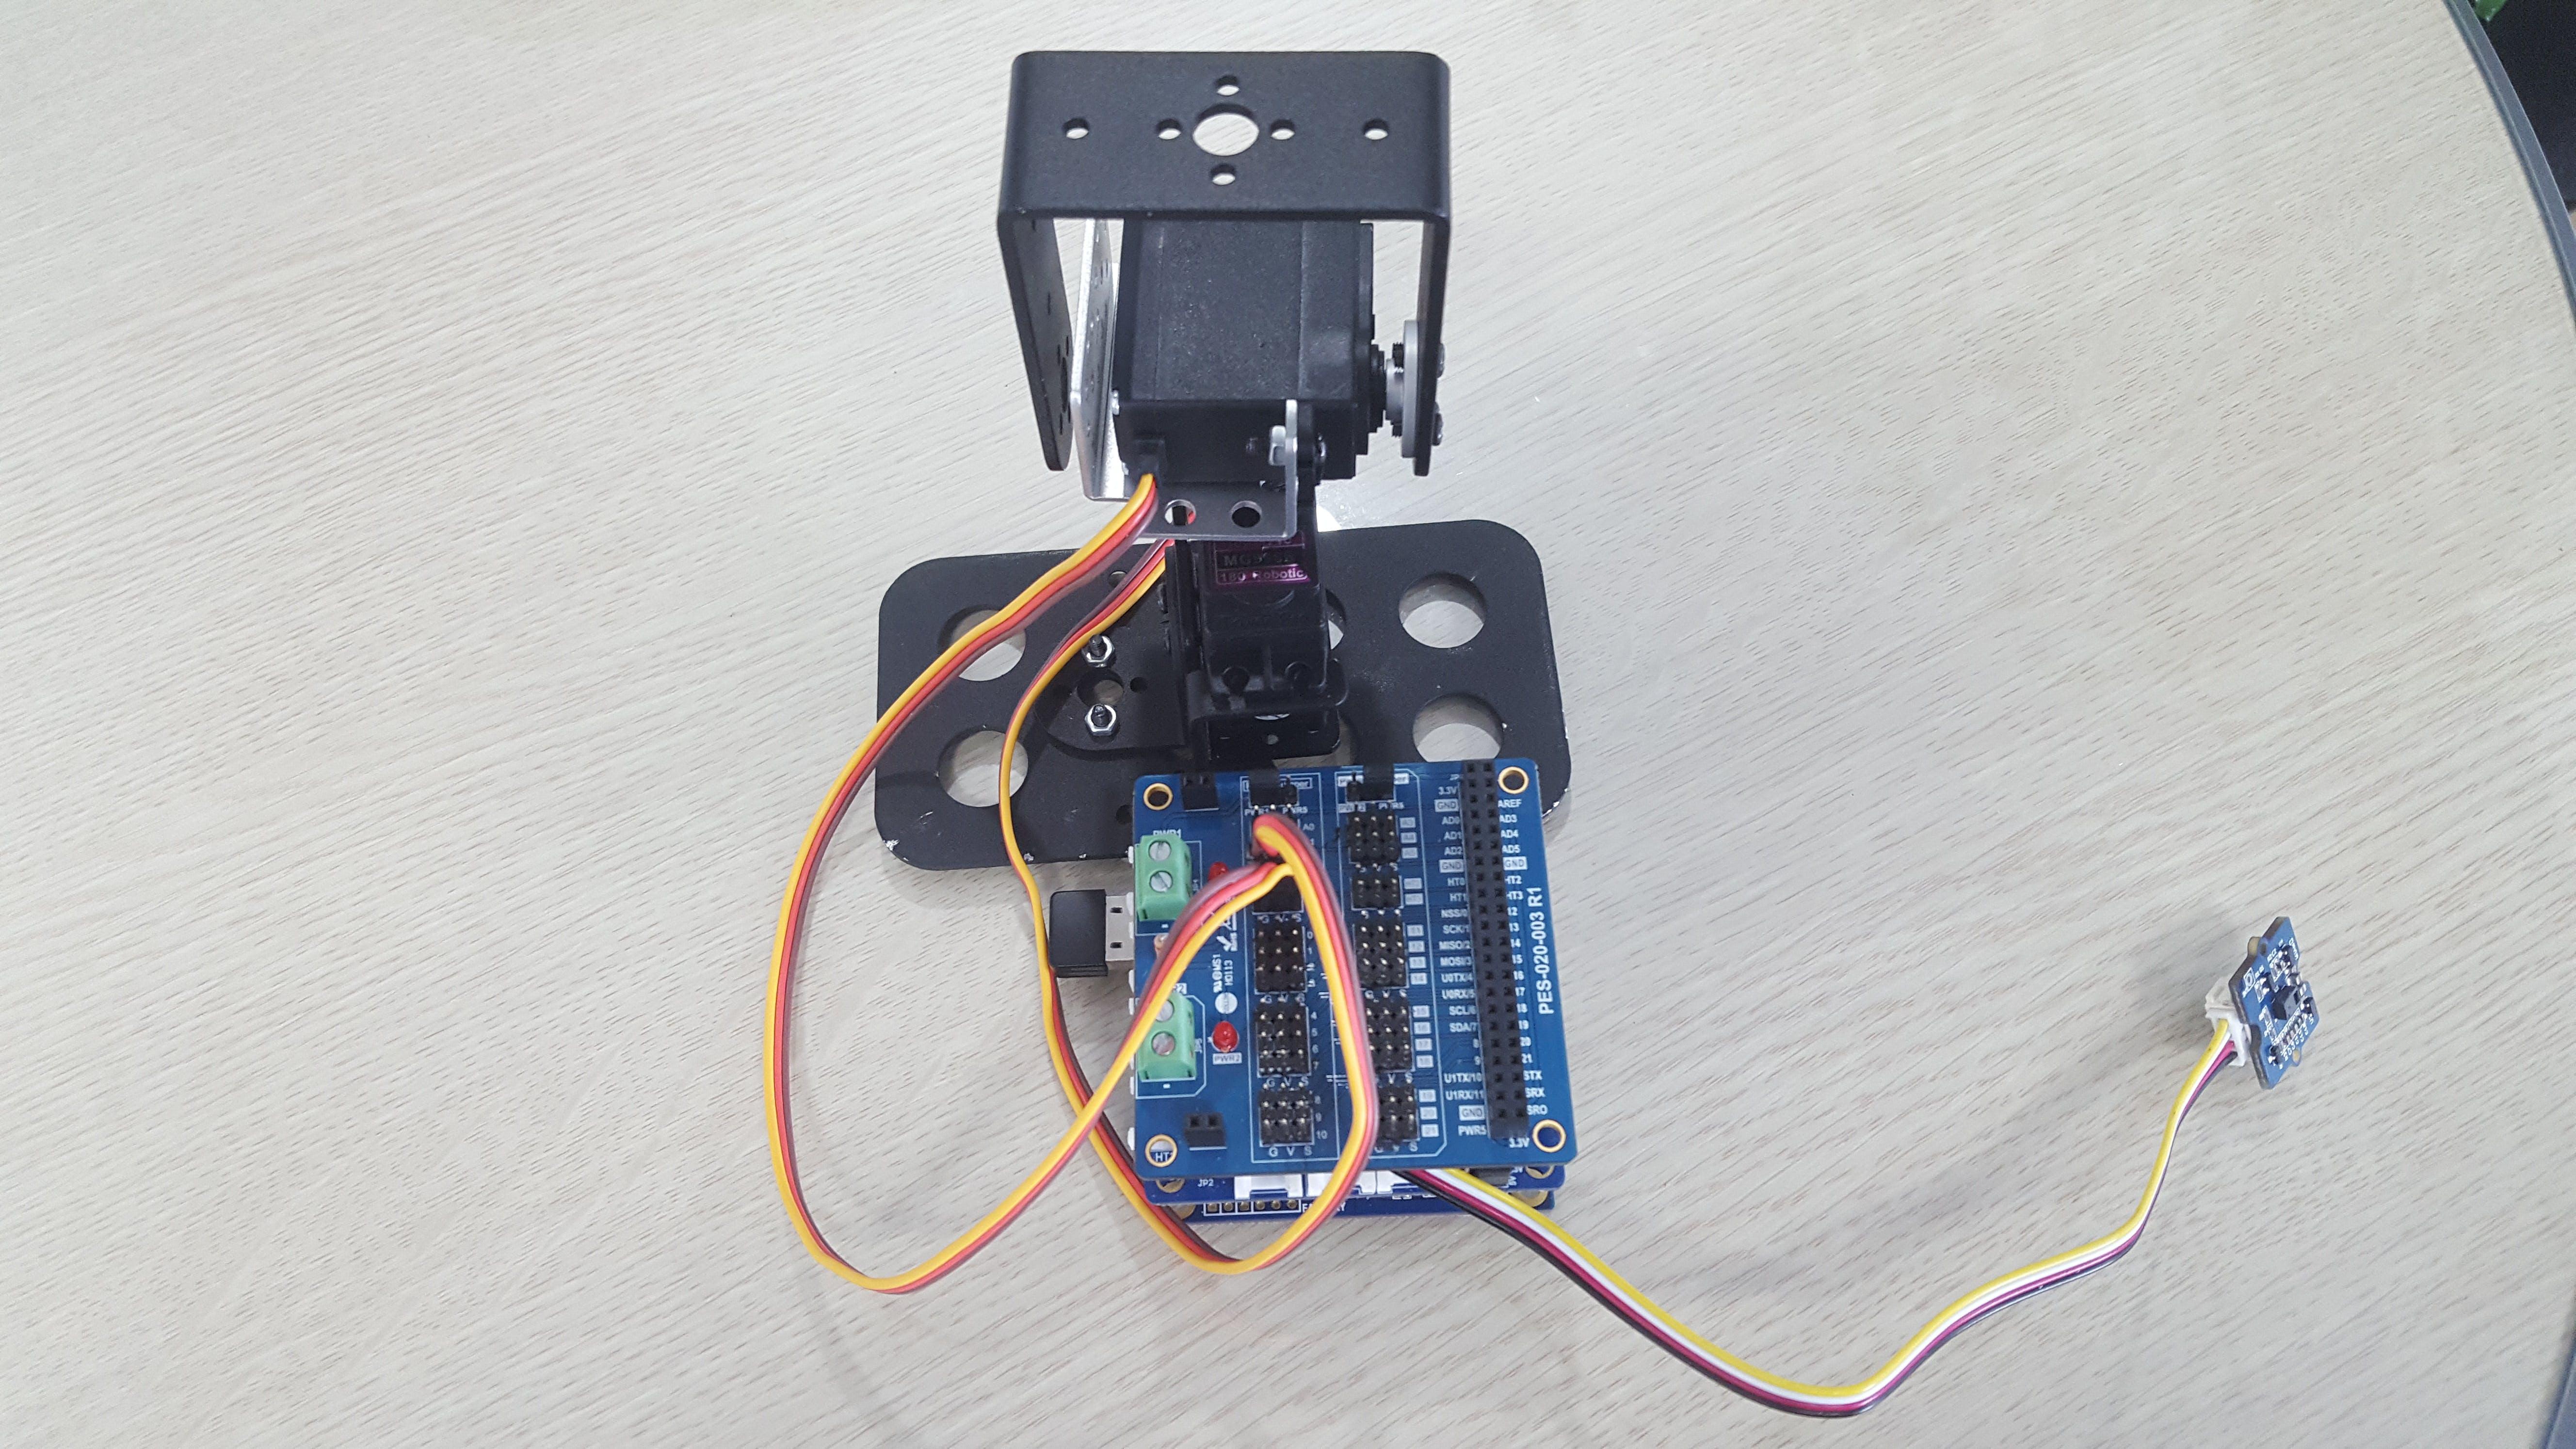 PHPoC Blue, gesture sensor and Pan-Tilt